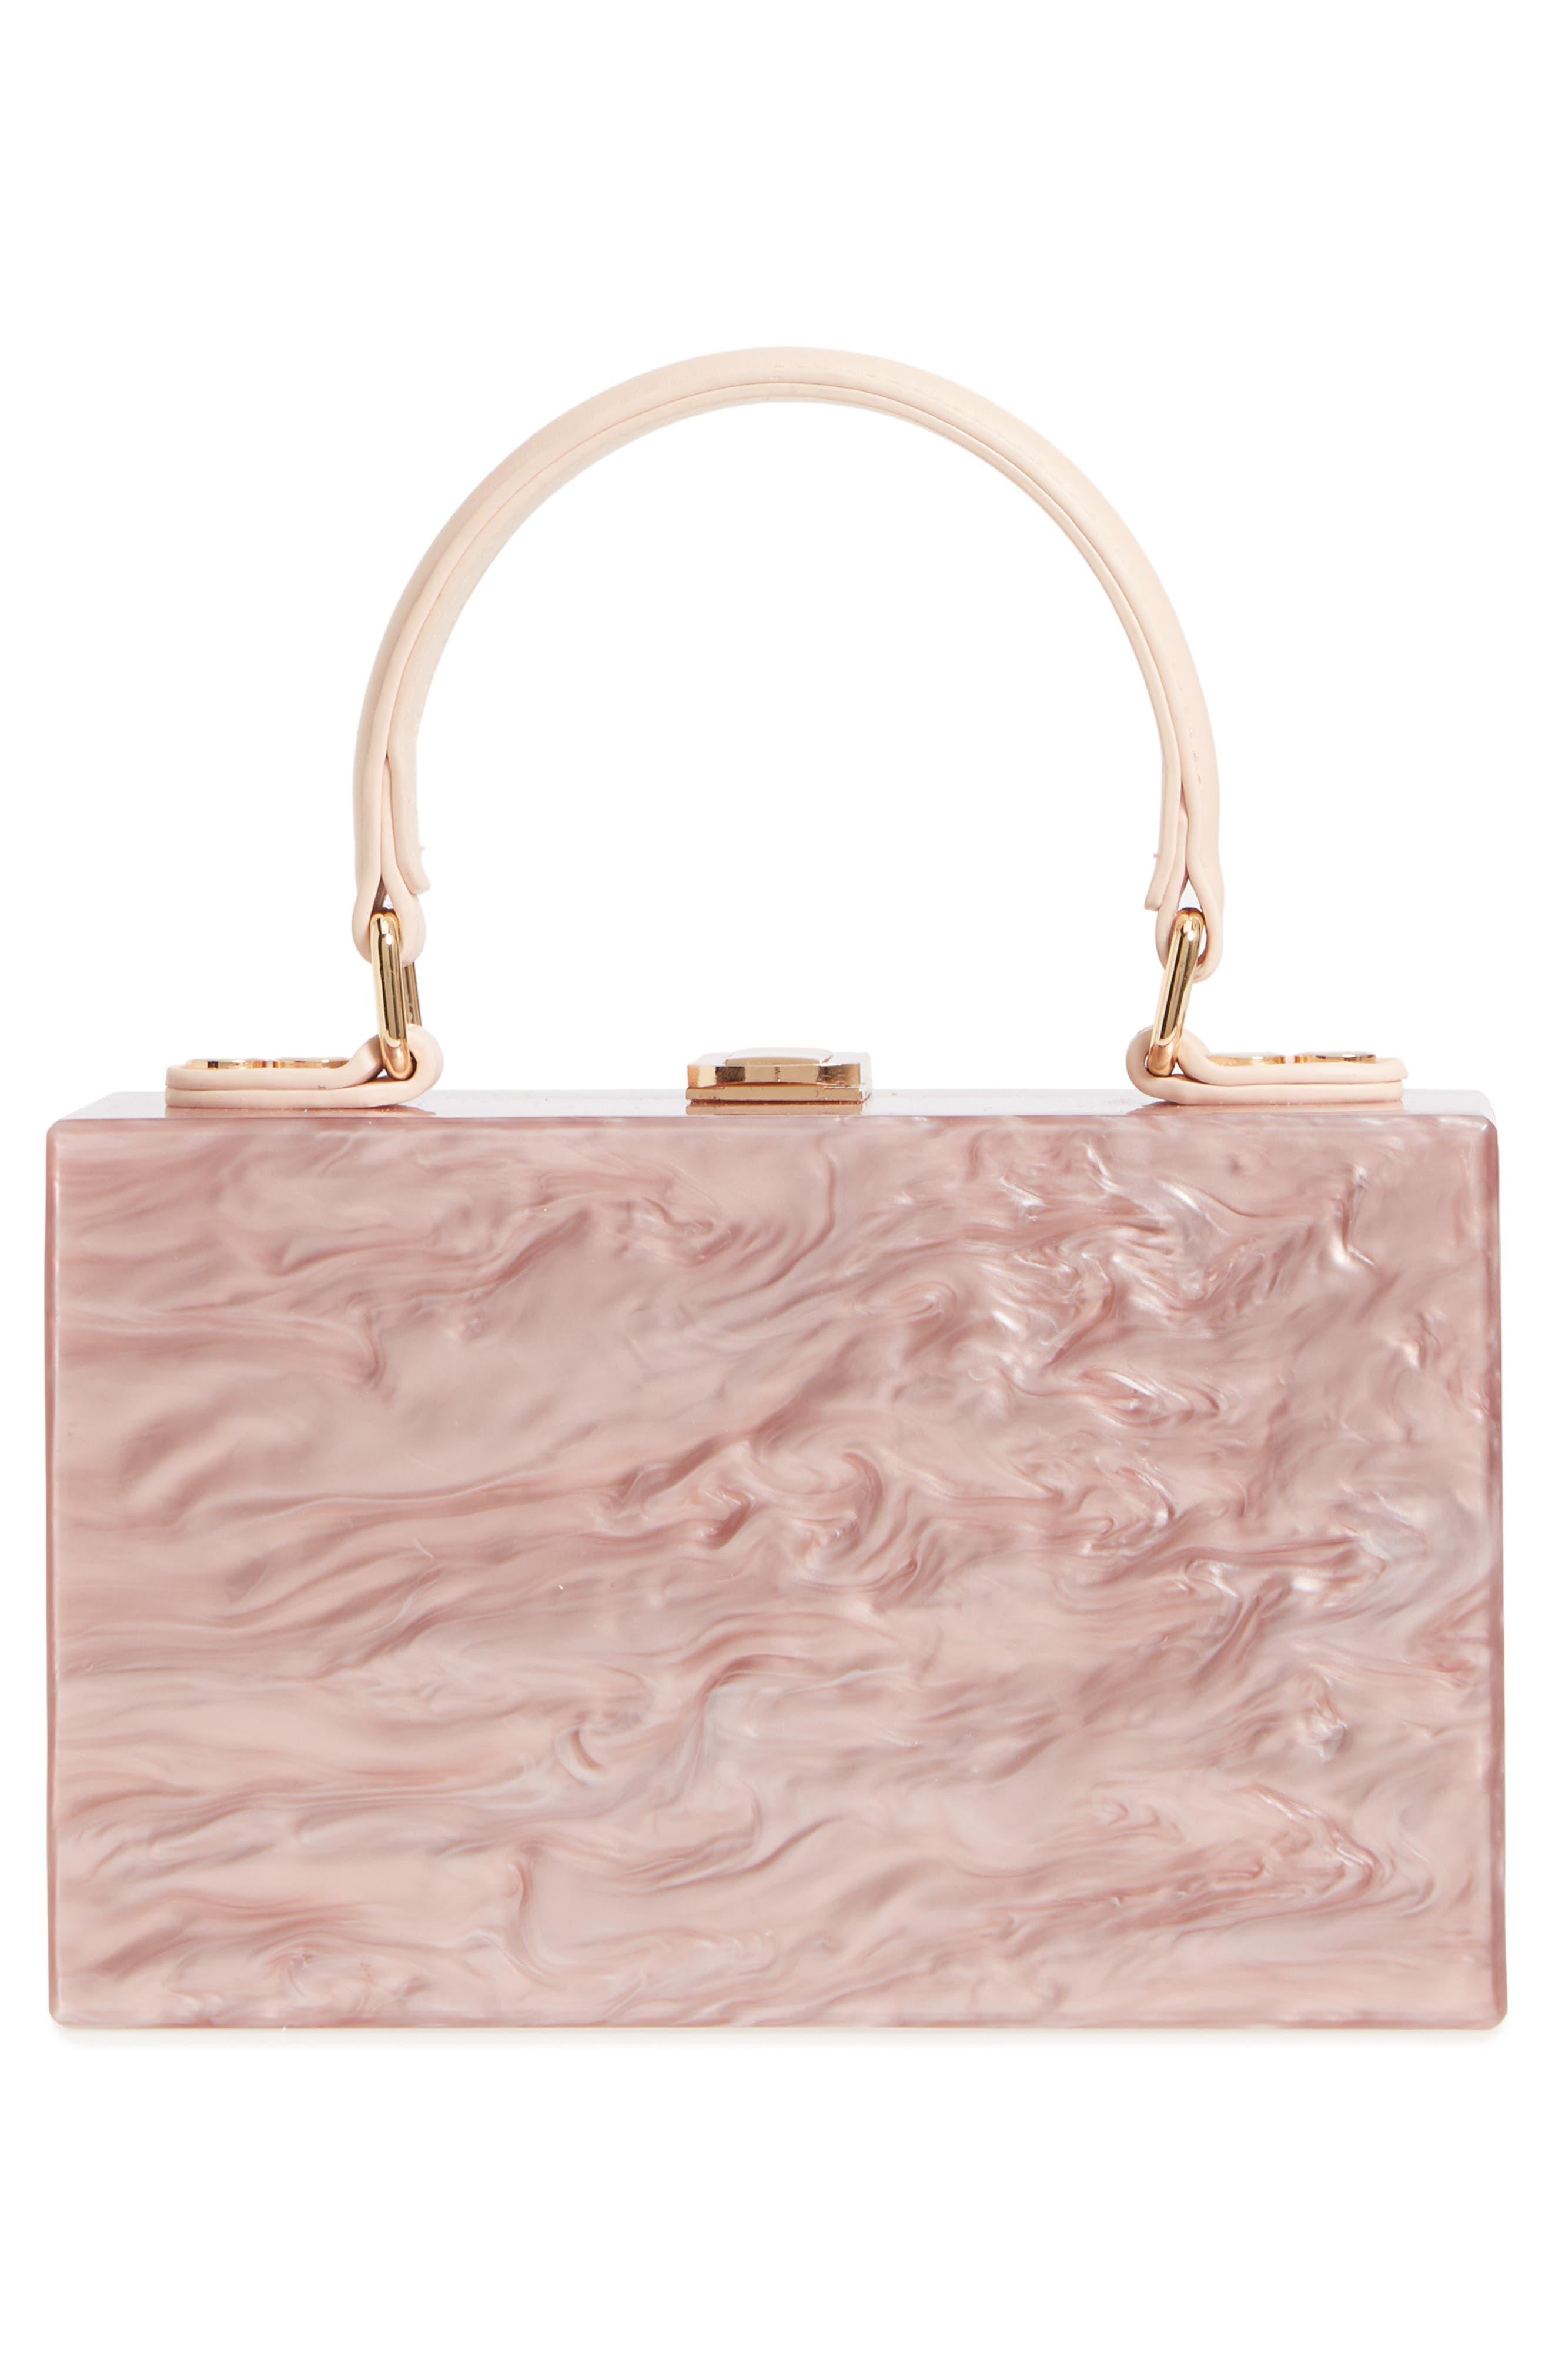 Clara Top Handle Box Clutch,                             Alternate thumbnail 3, color,                             Pink